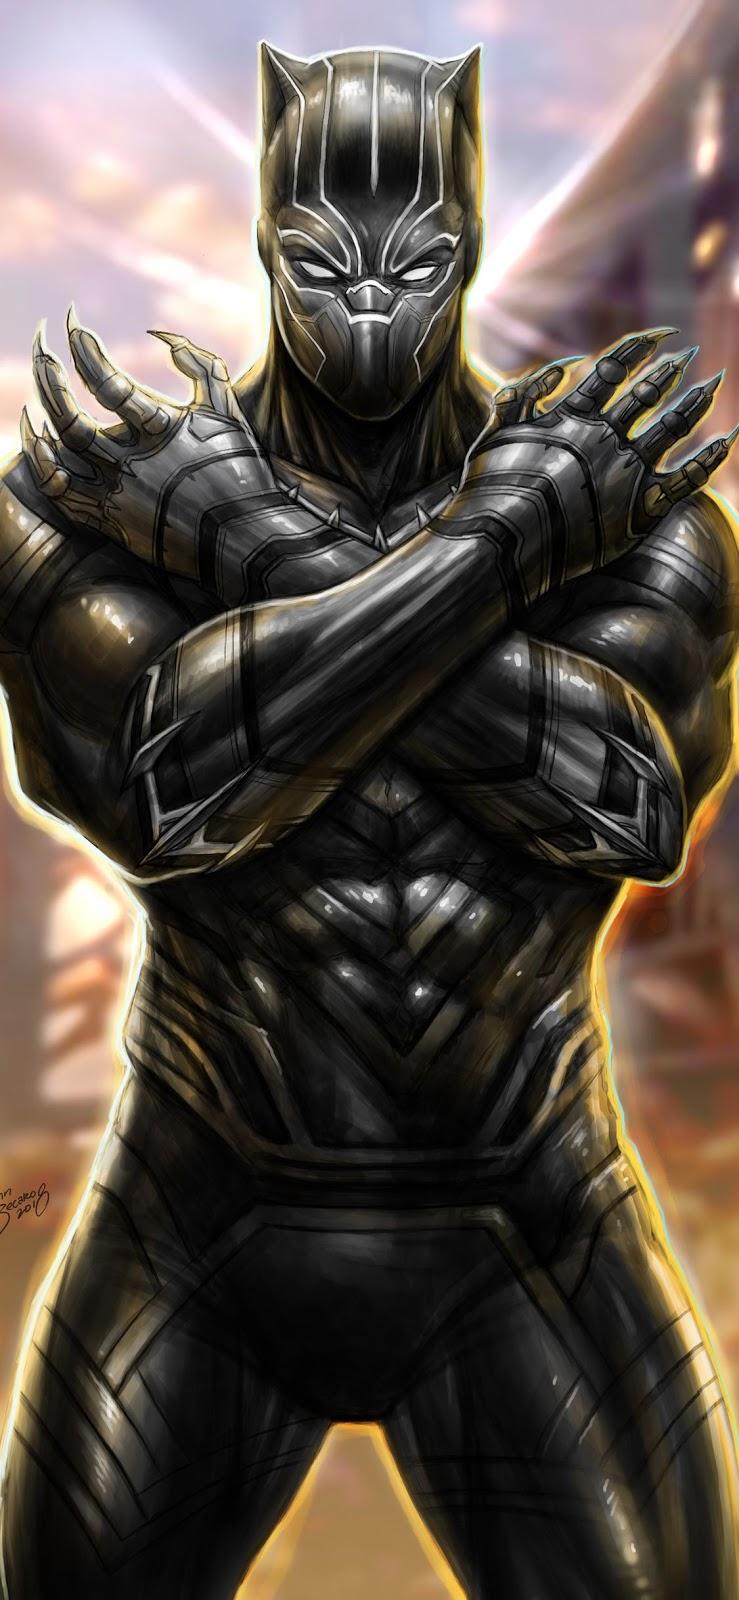 Black Panther Photos, Images, Wallpaper